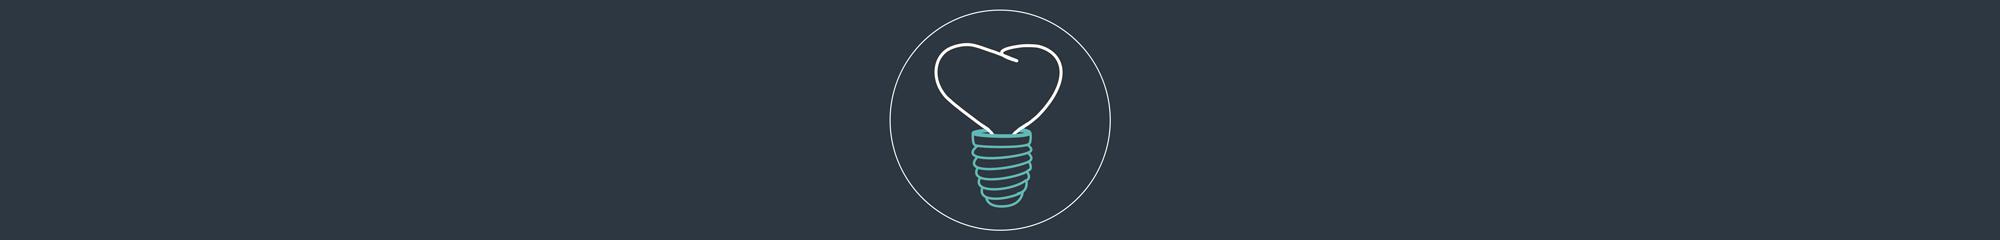 Icon Implantat